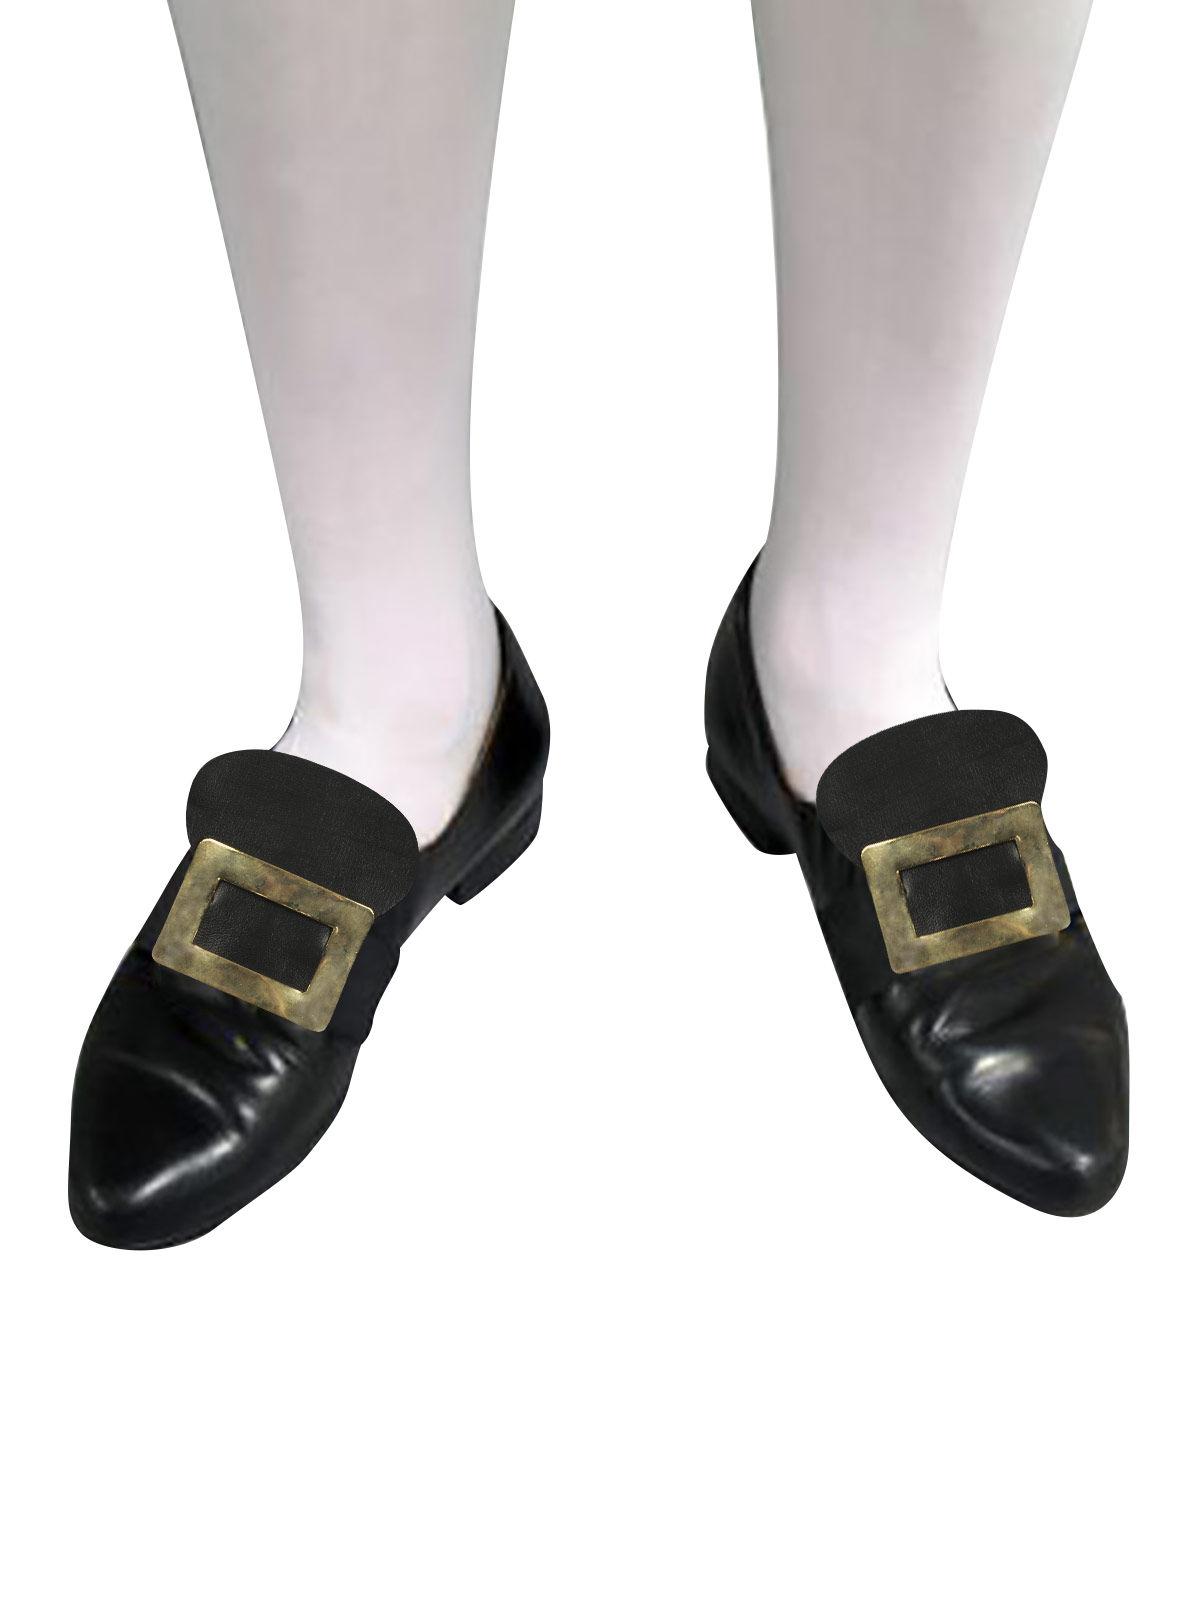 Barock Schuhschnalle Mittelalter Schnalle für Schuhe Schuhschnallen Barock